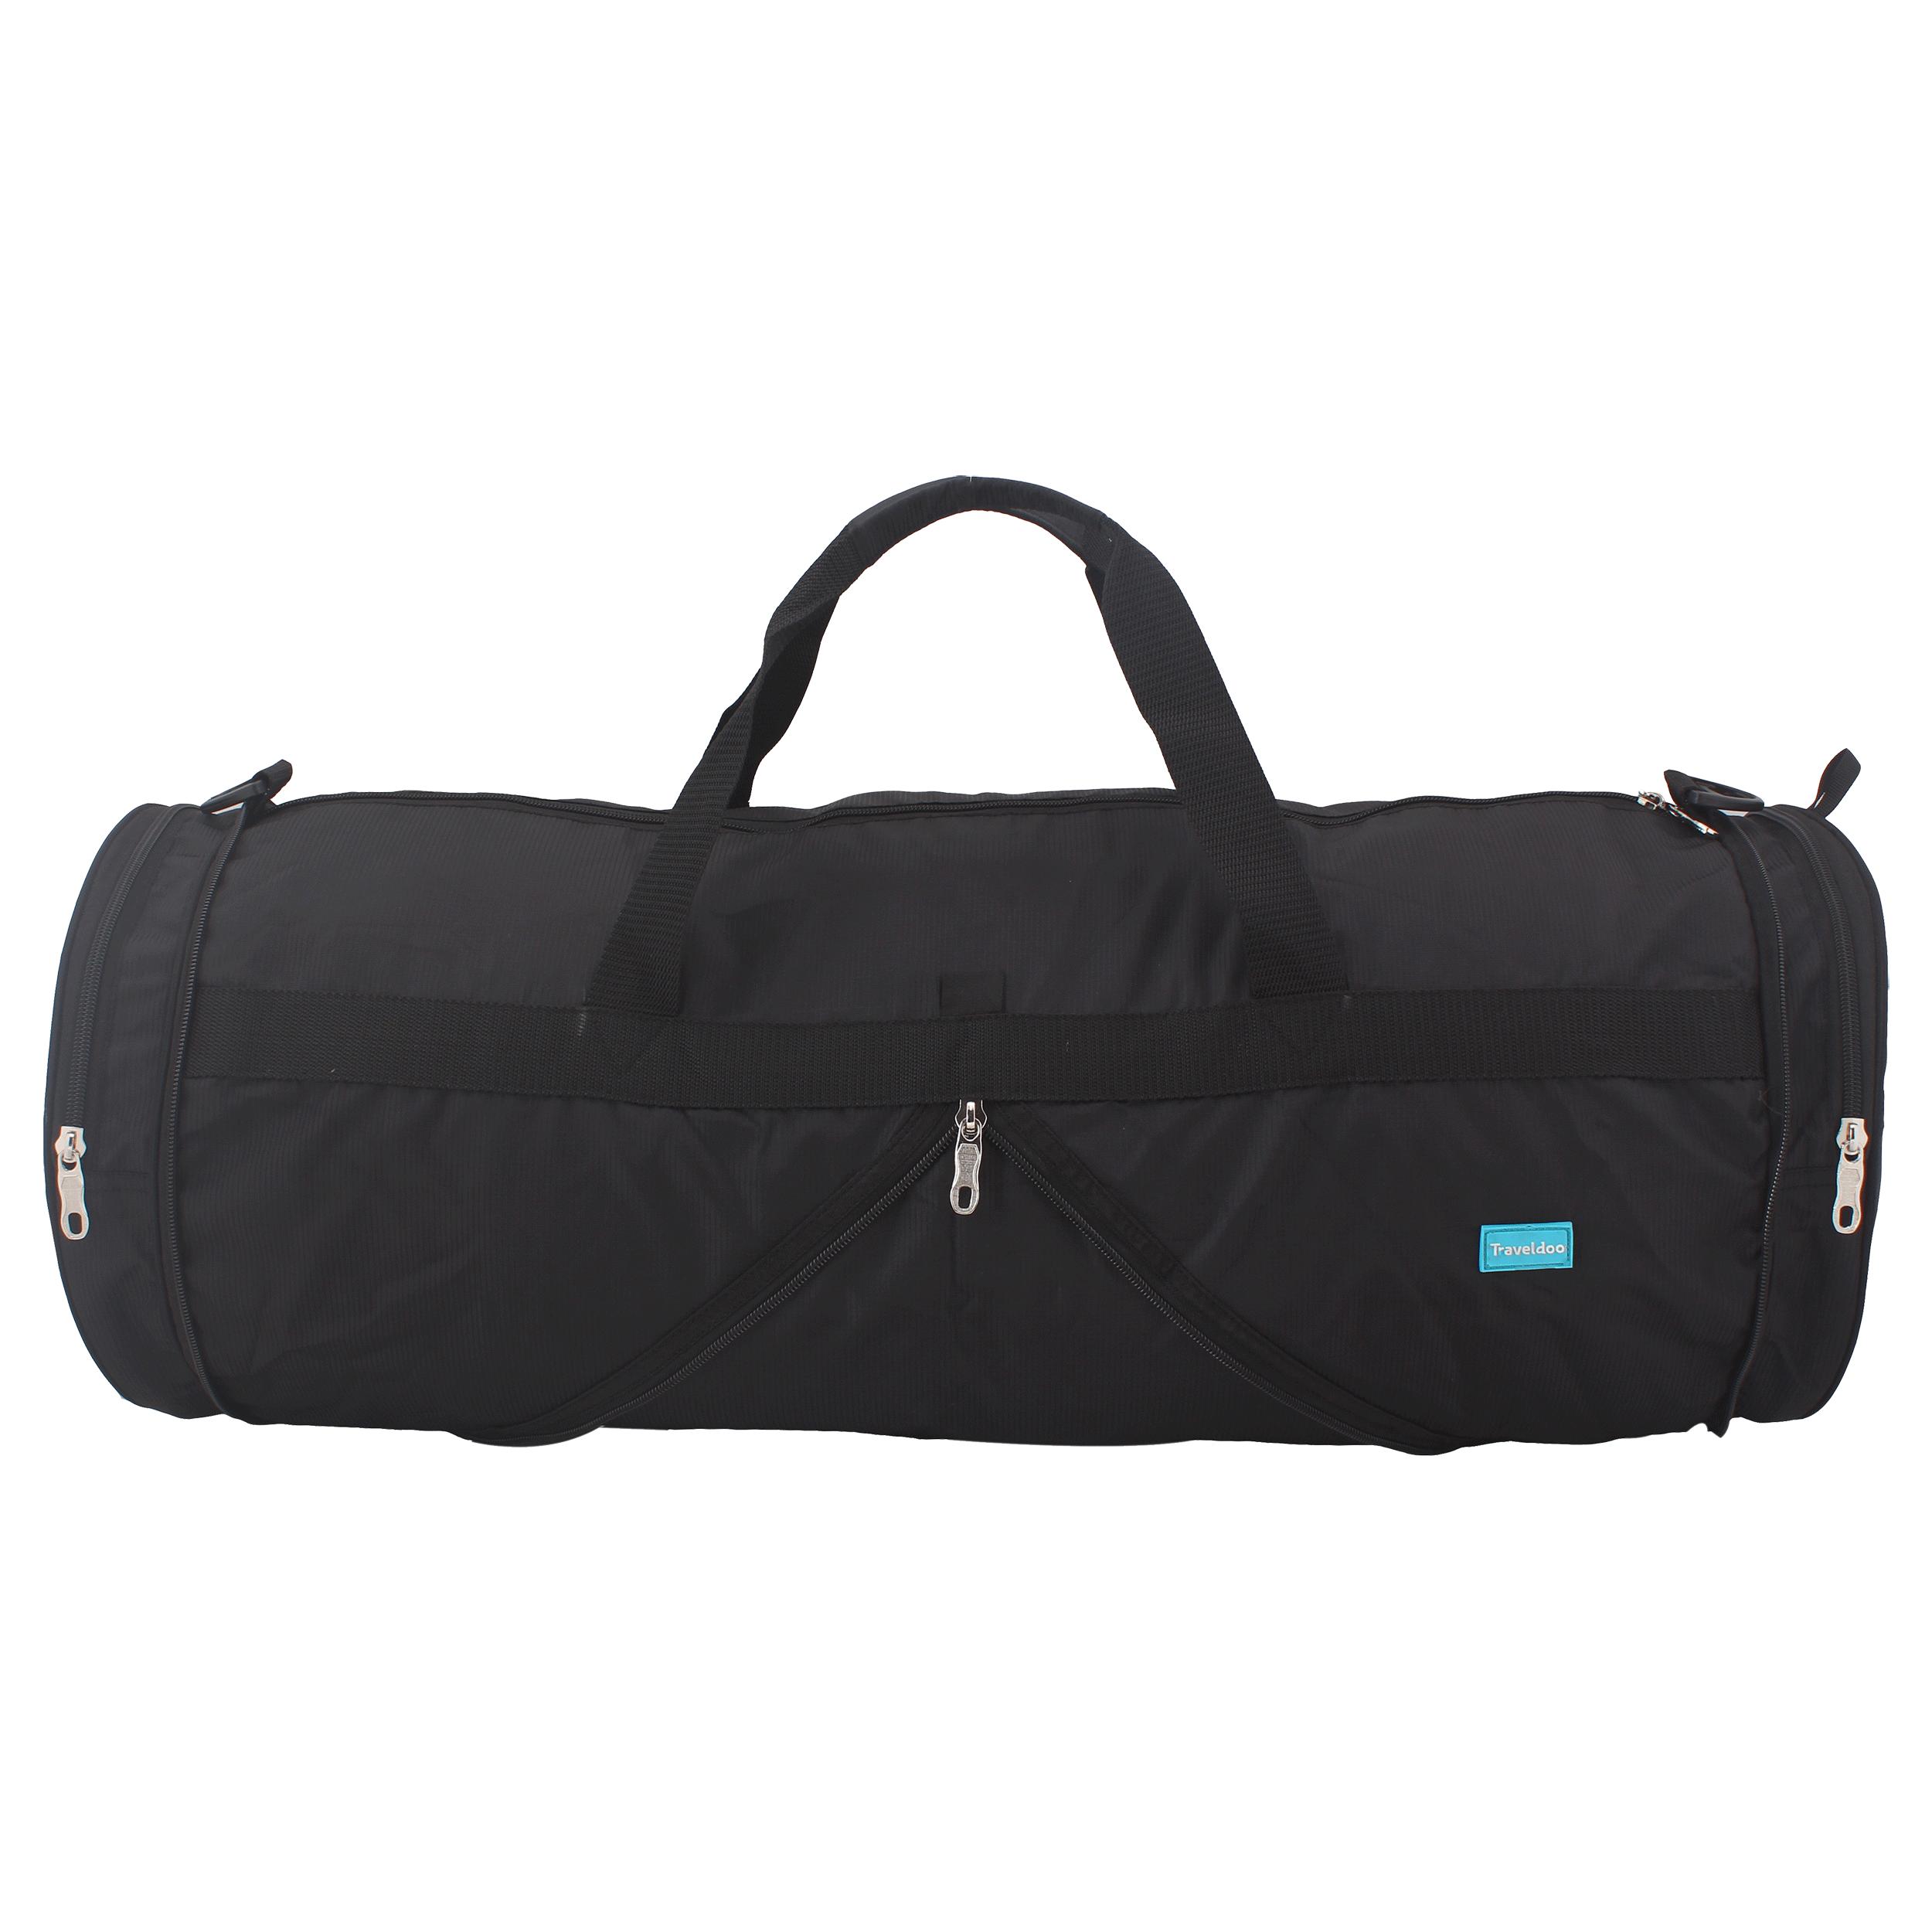 Traveldoo 28 inch Round Folding Duffle Bag (DBR03001, Black)_1